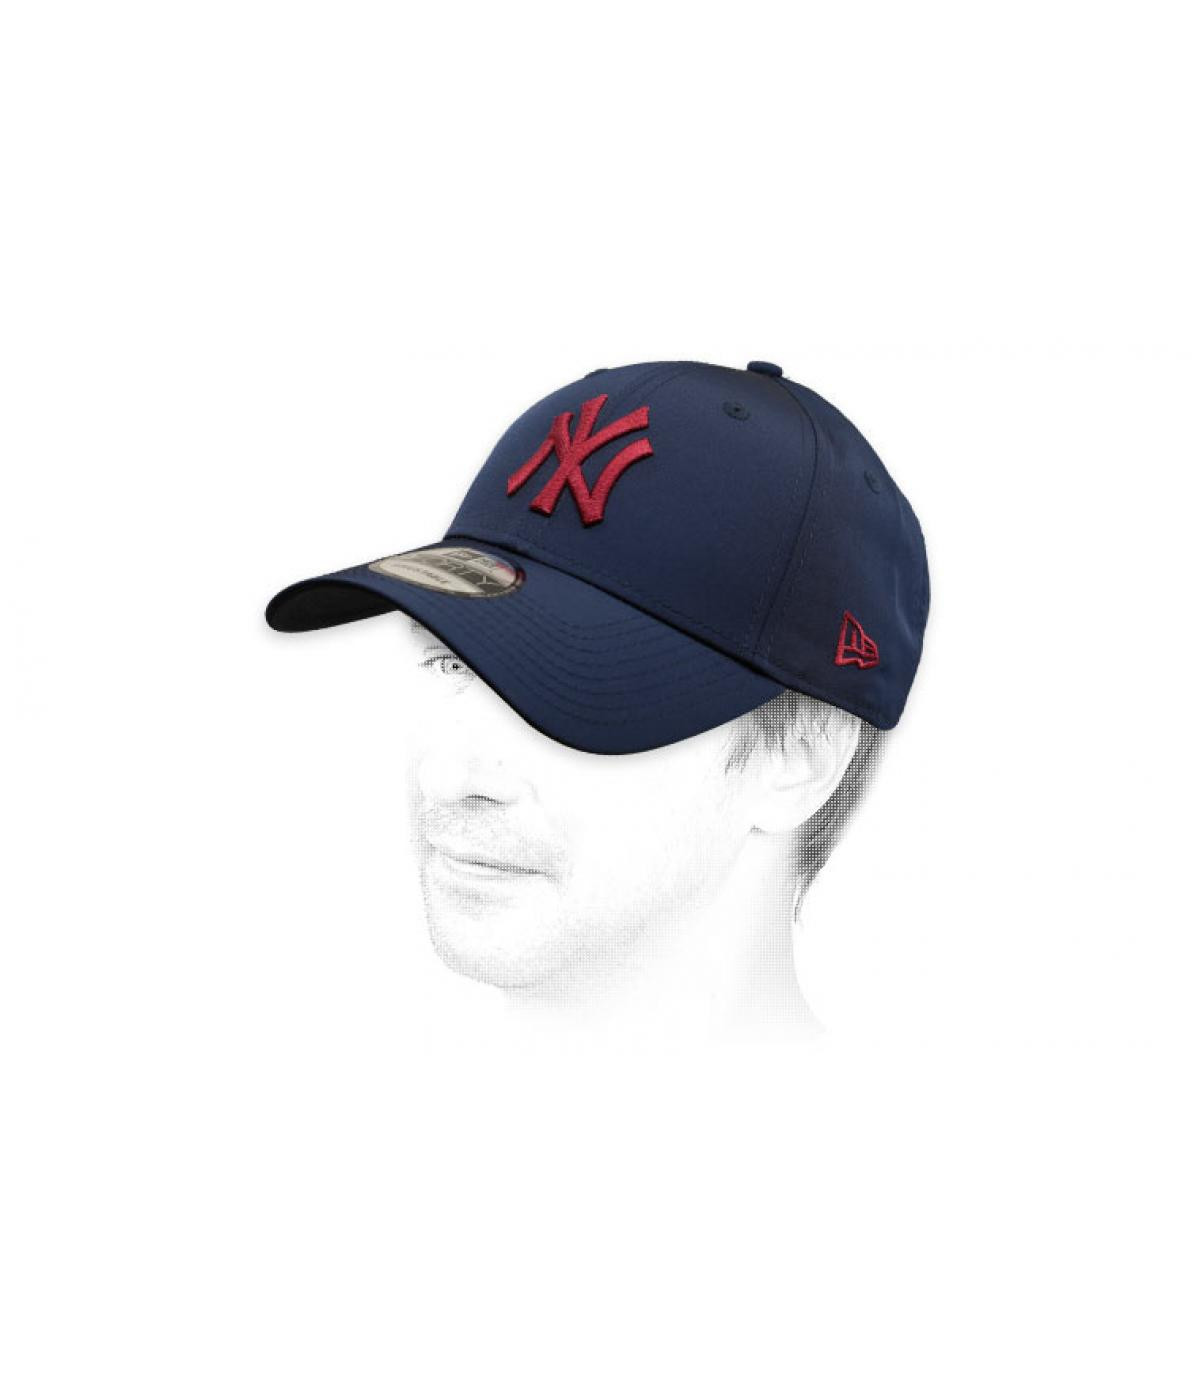 blue burgundy NY cap